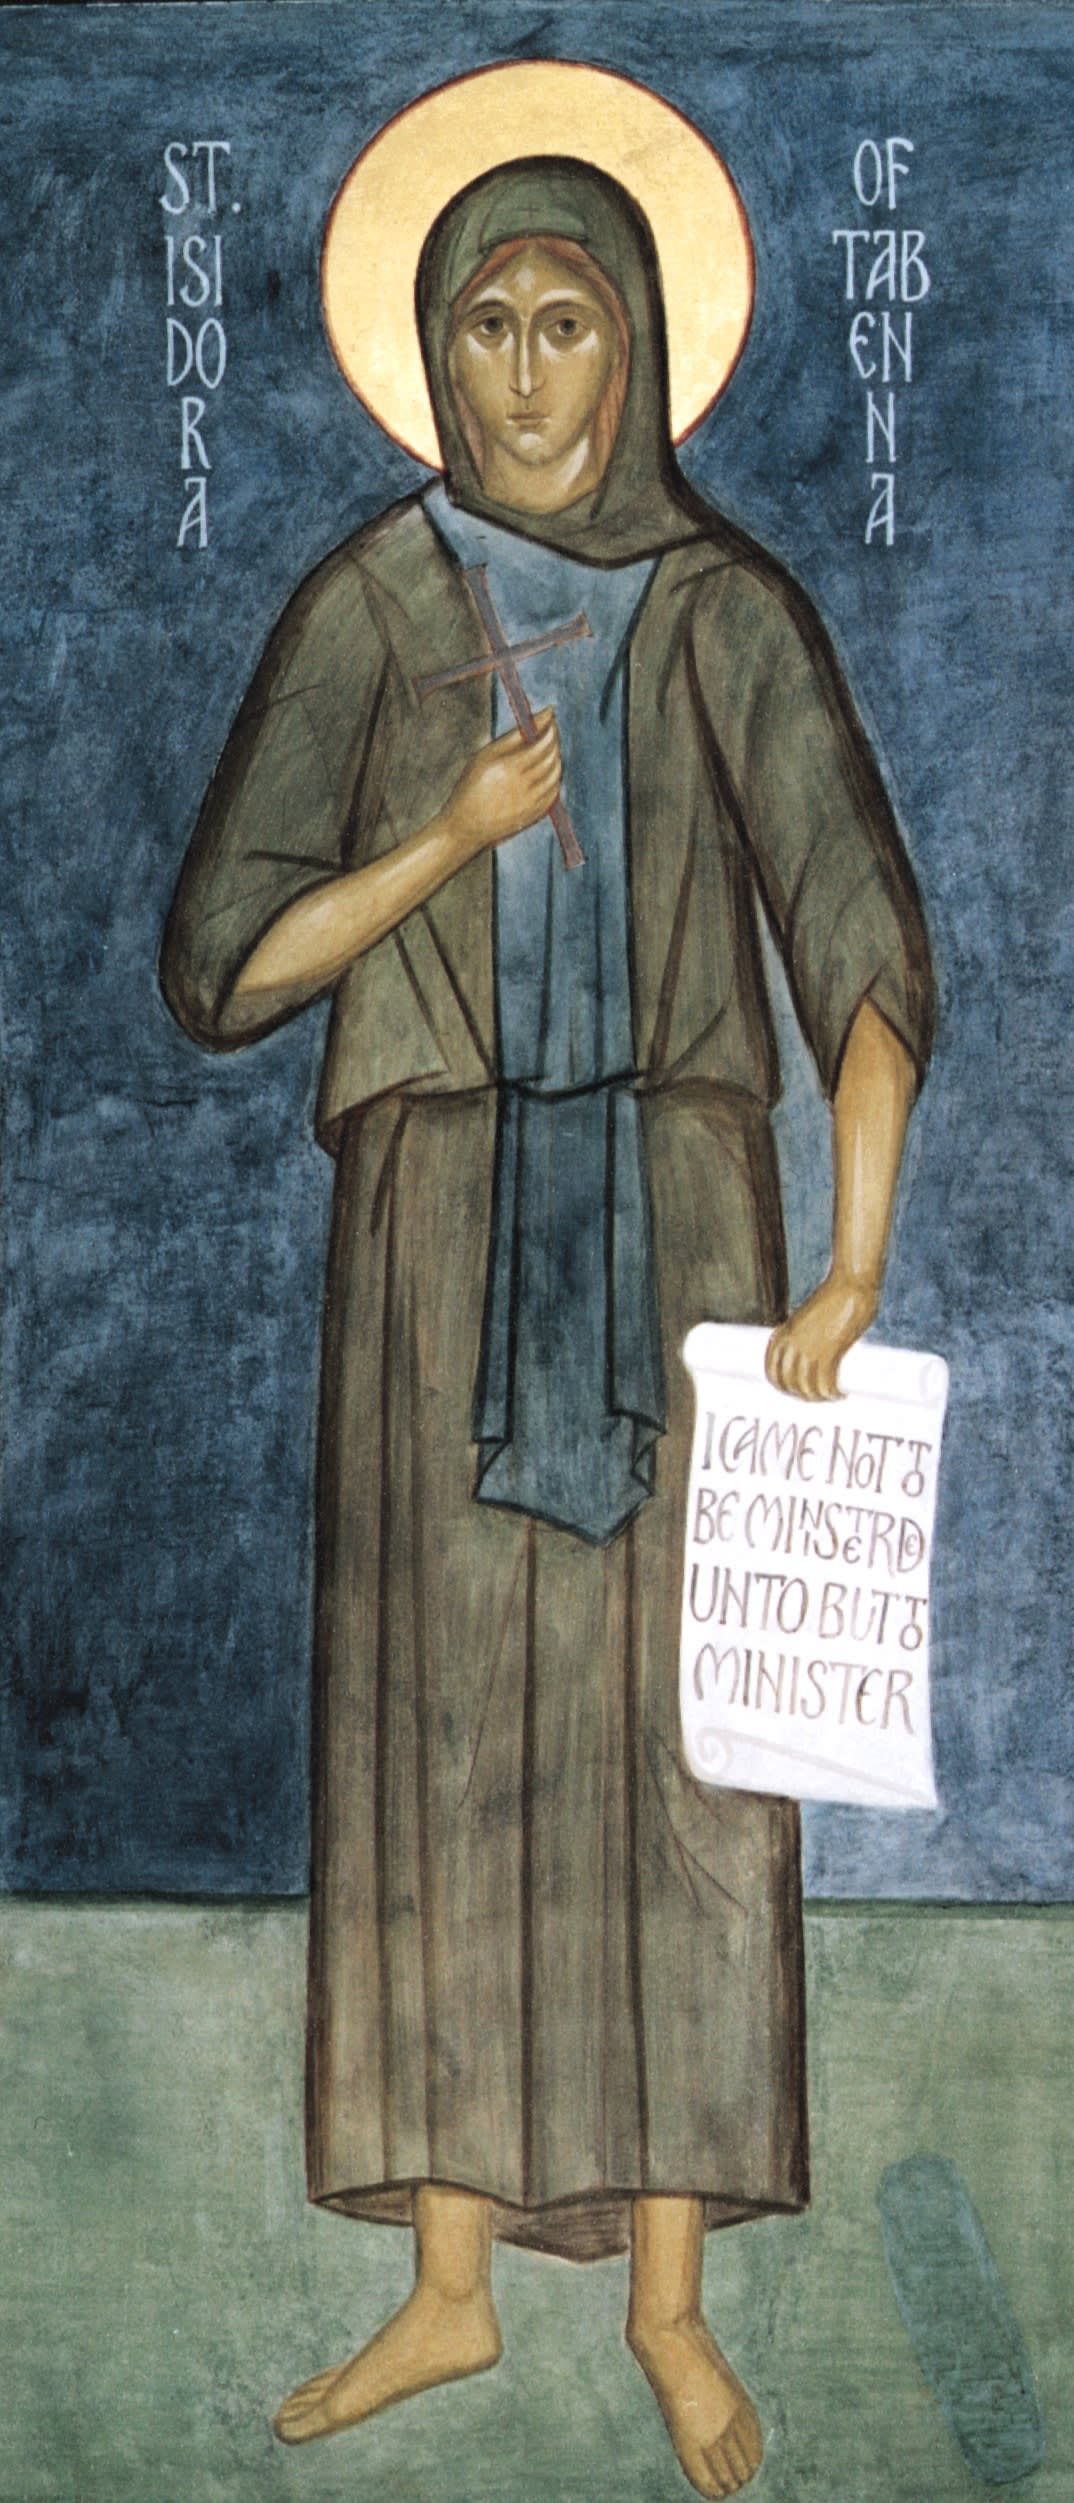 Saint Isidora